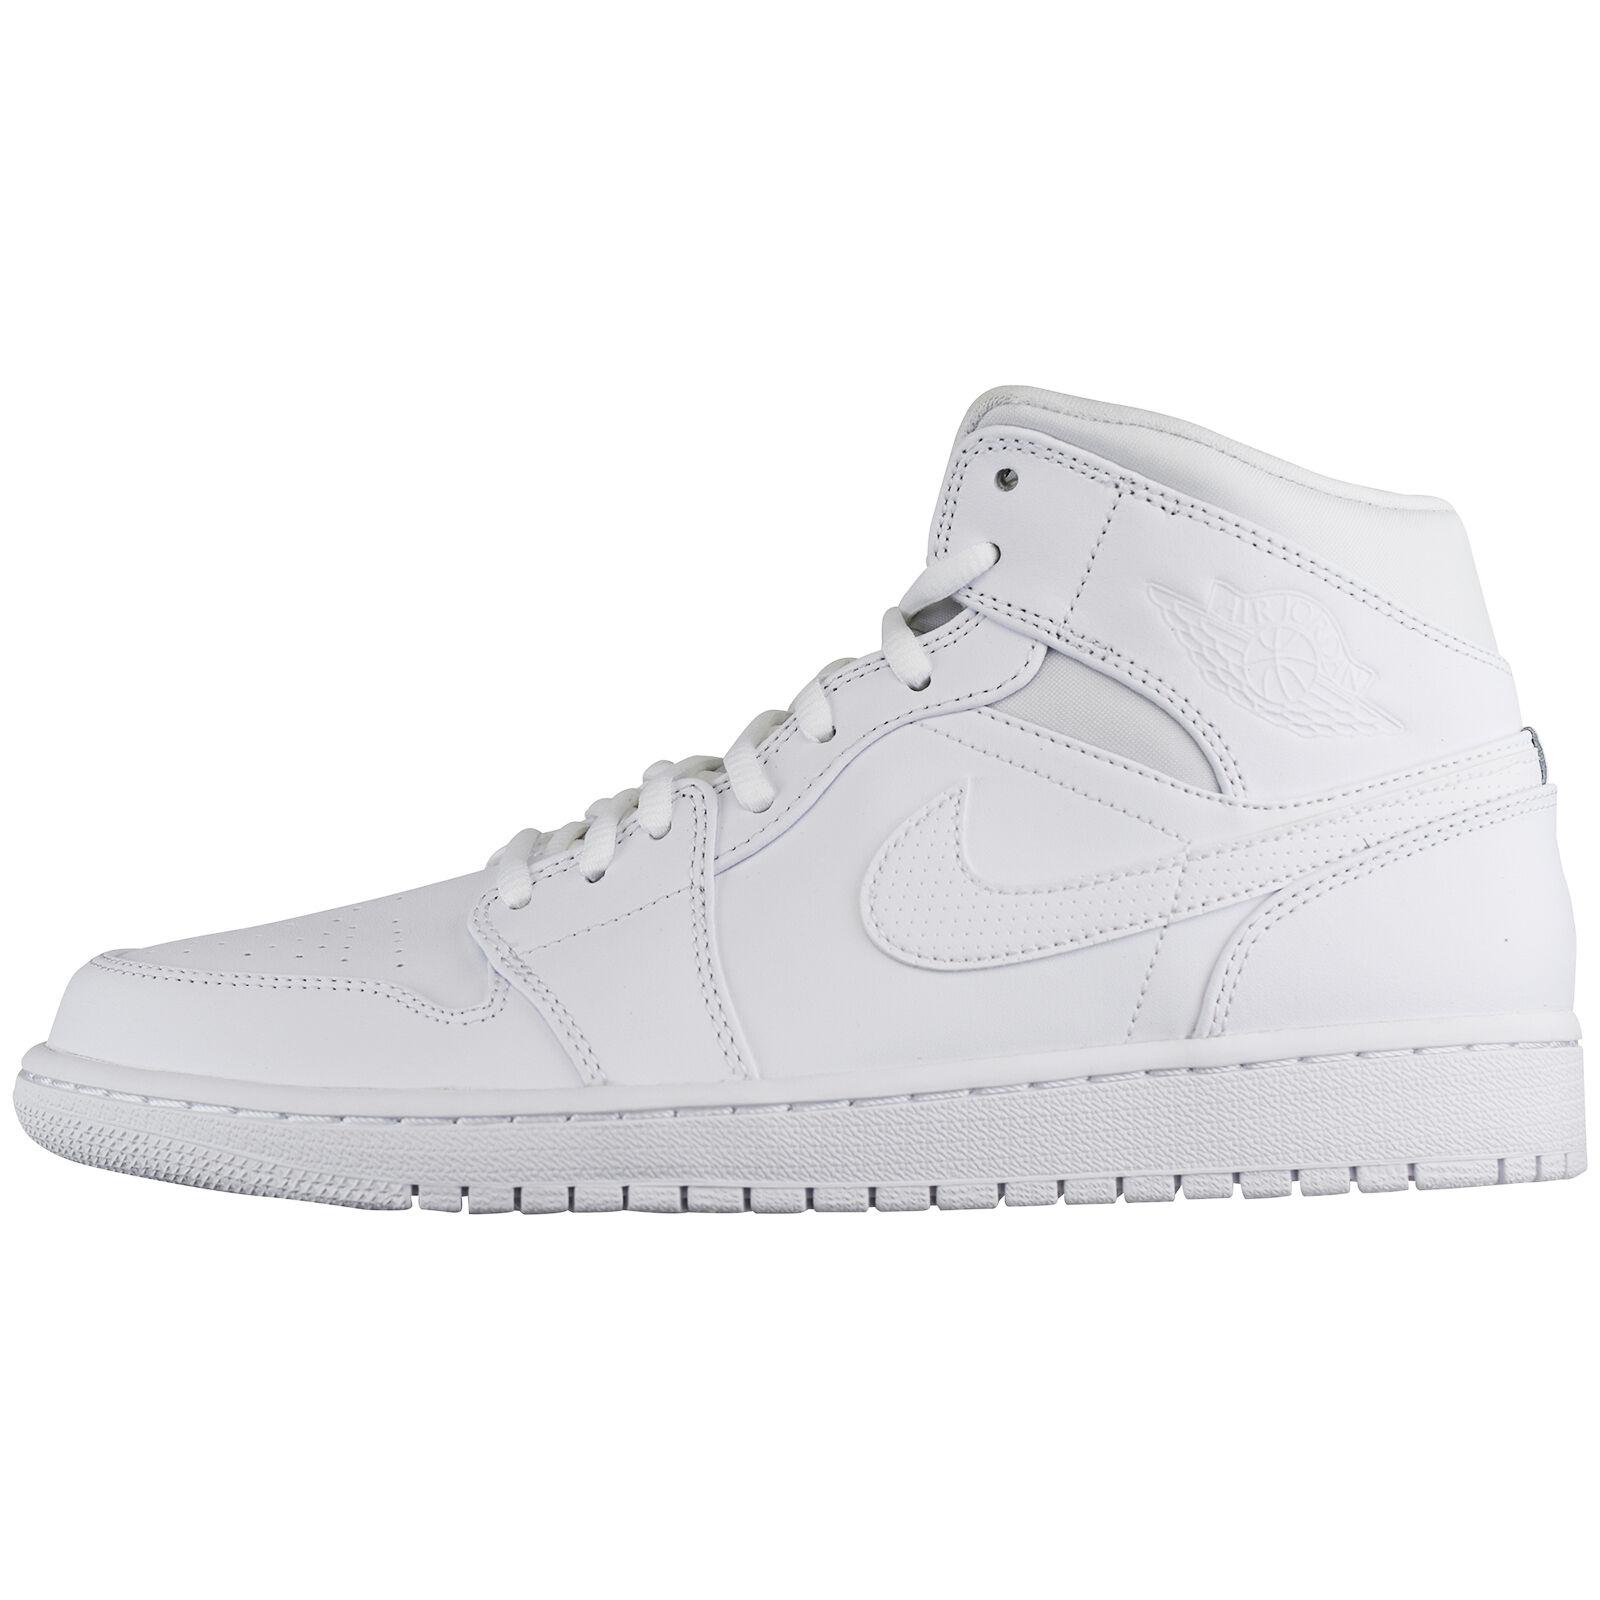 Nike Air Jordan 1 Freizeit MID 554724-110 Basketball Laufschuhe Run Freizeit 1 Sneaker 9307b5